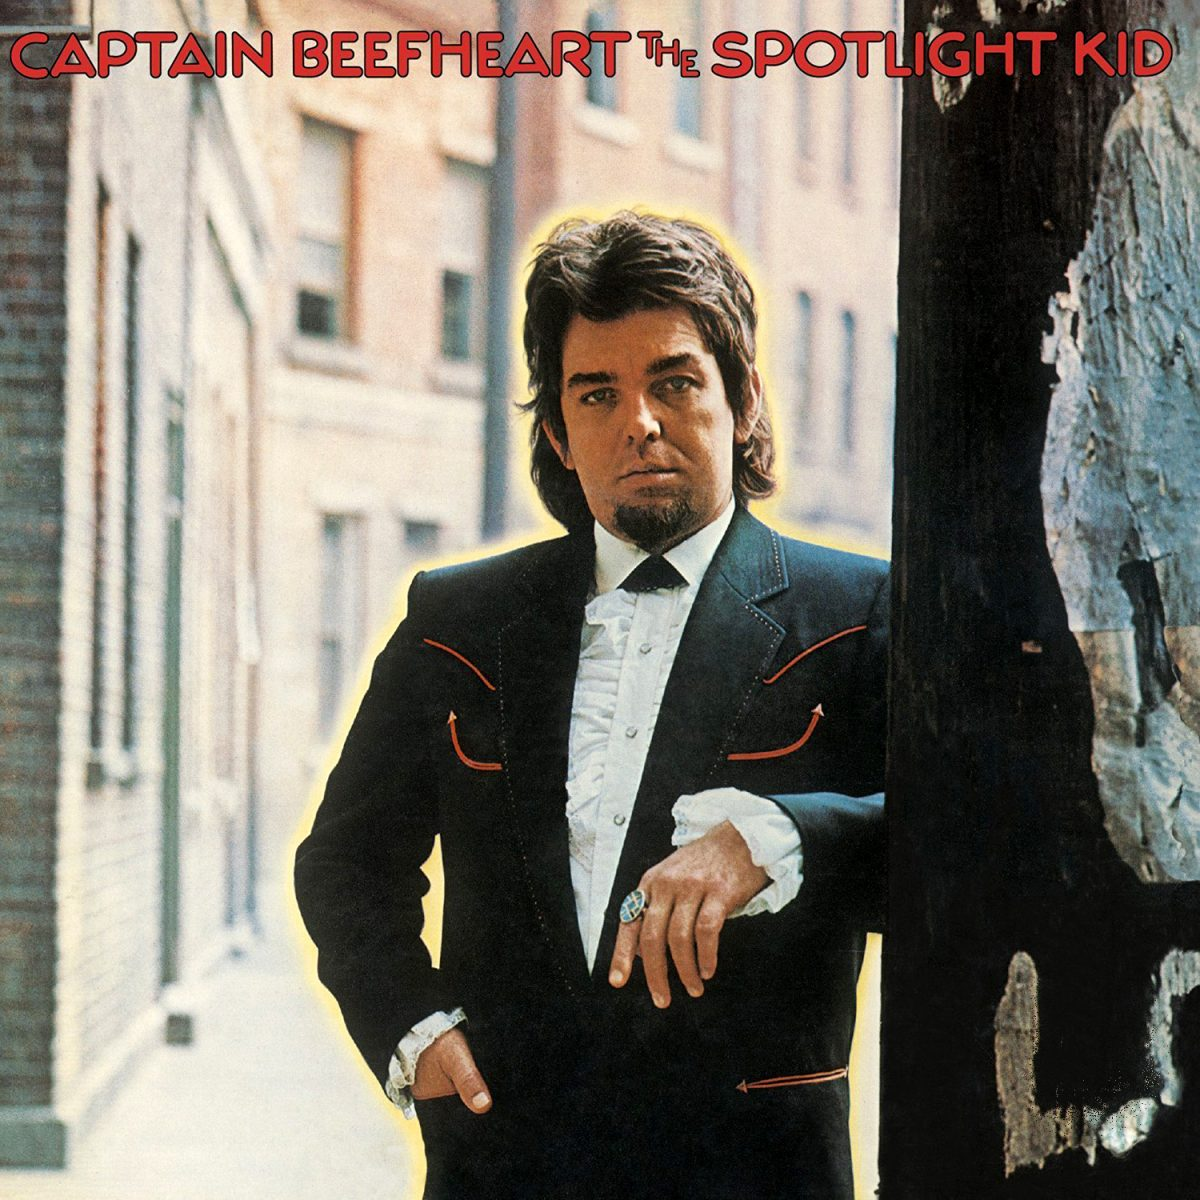 Captain Beefheart And The Magic Band: The Spotlight Kid / Clear Spot (1972)